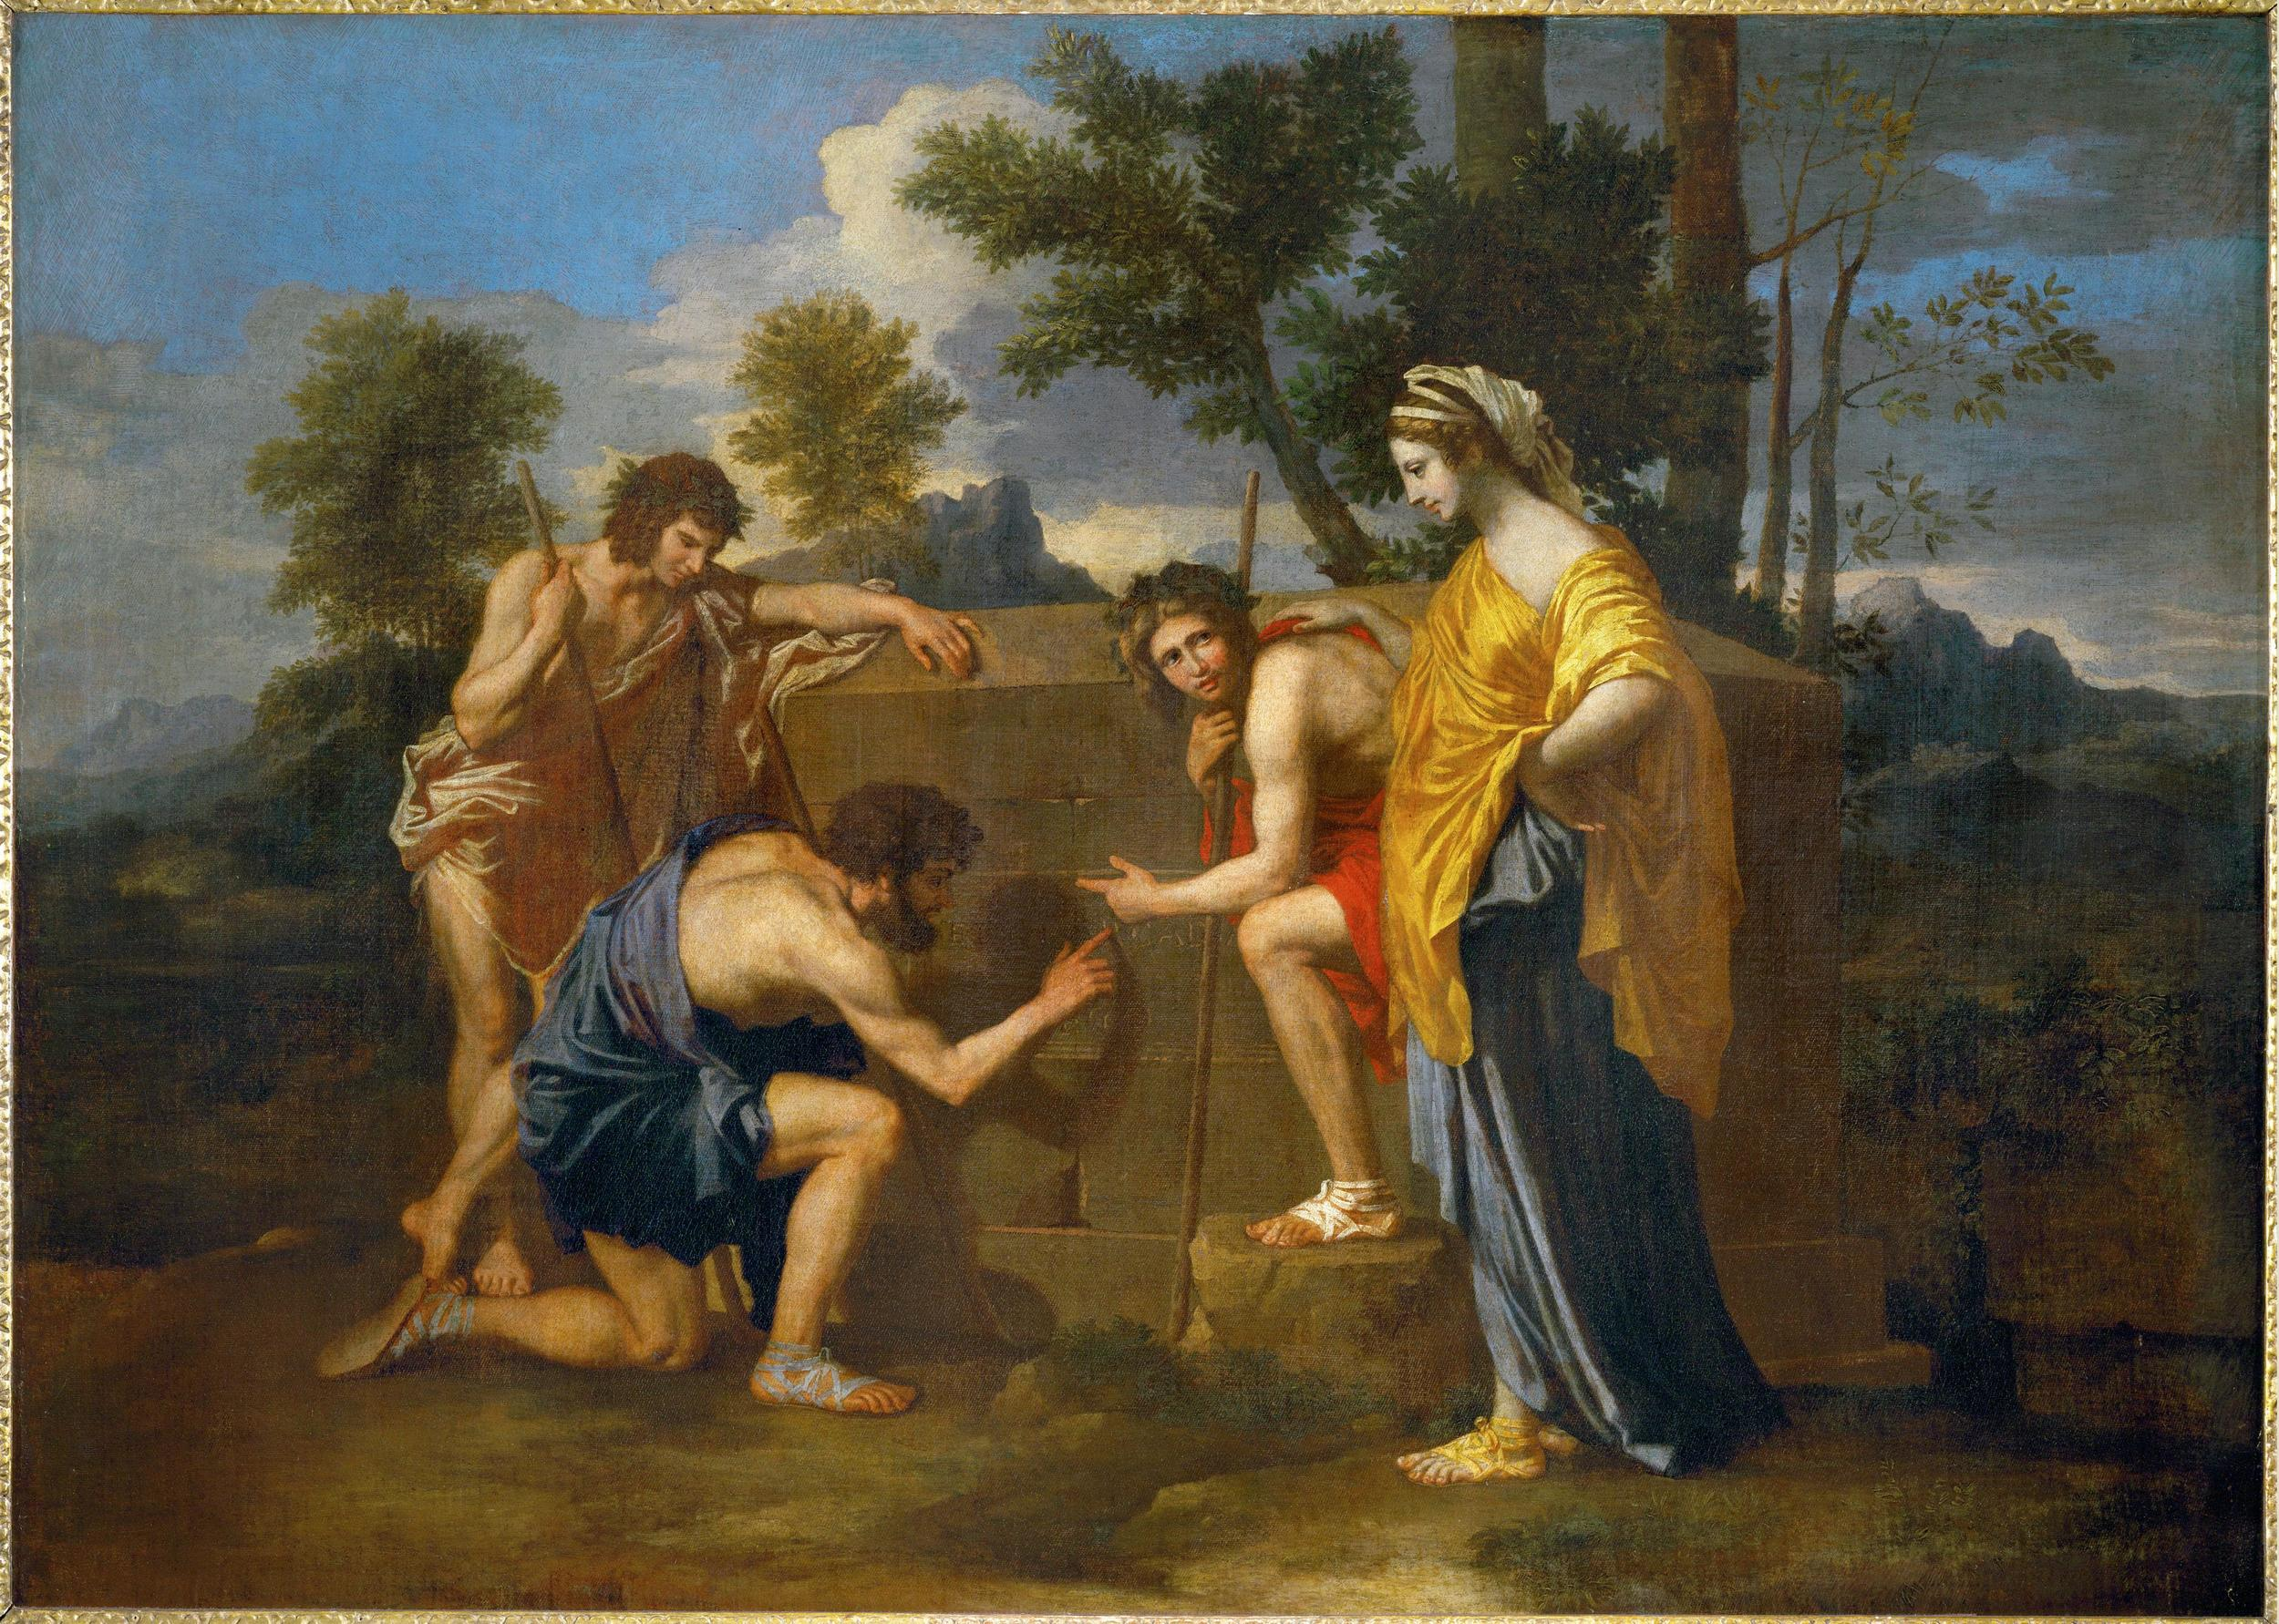 Nicolas Poussin,  Et in Arcadia ego (Les Bergers d'Arcadie) , late 1630s, Louvre, Paris.